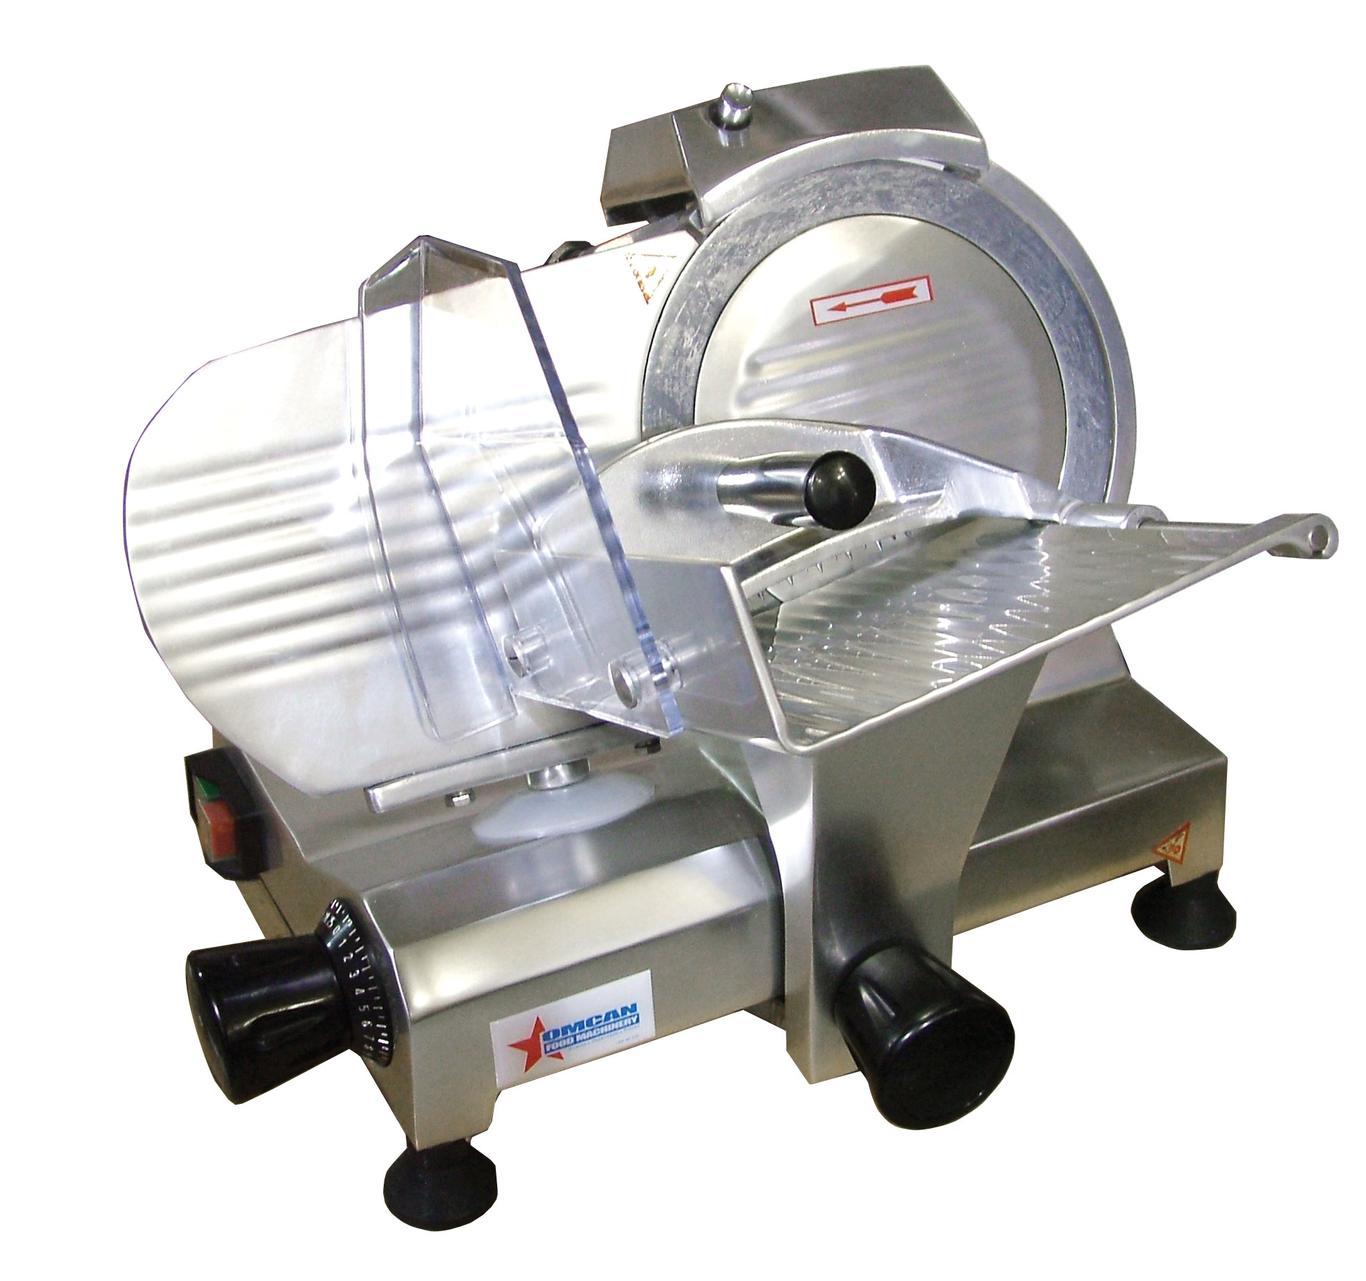 eurodib manual meat slicer reviews